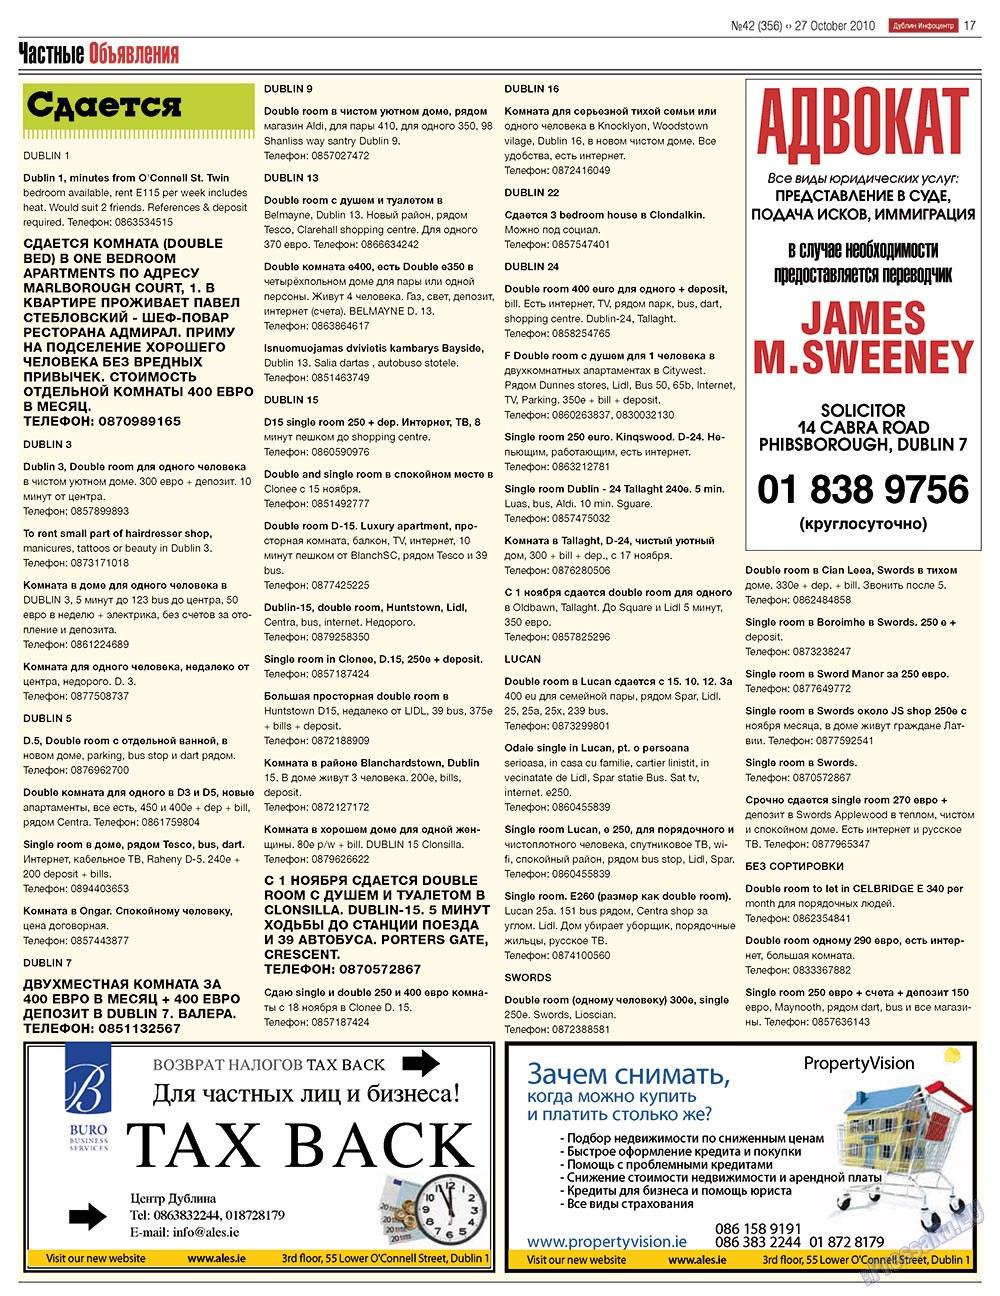 Дублин инфоцентр (газета). 2010 год, номер 42, стр. 17